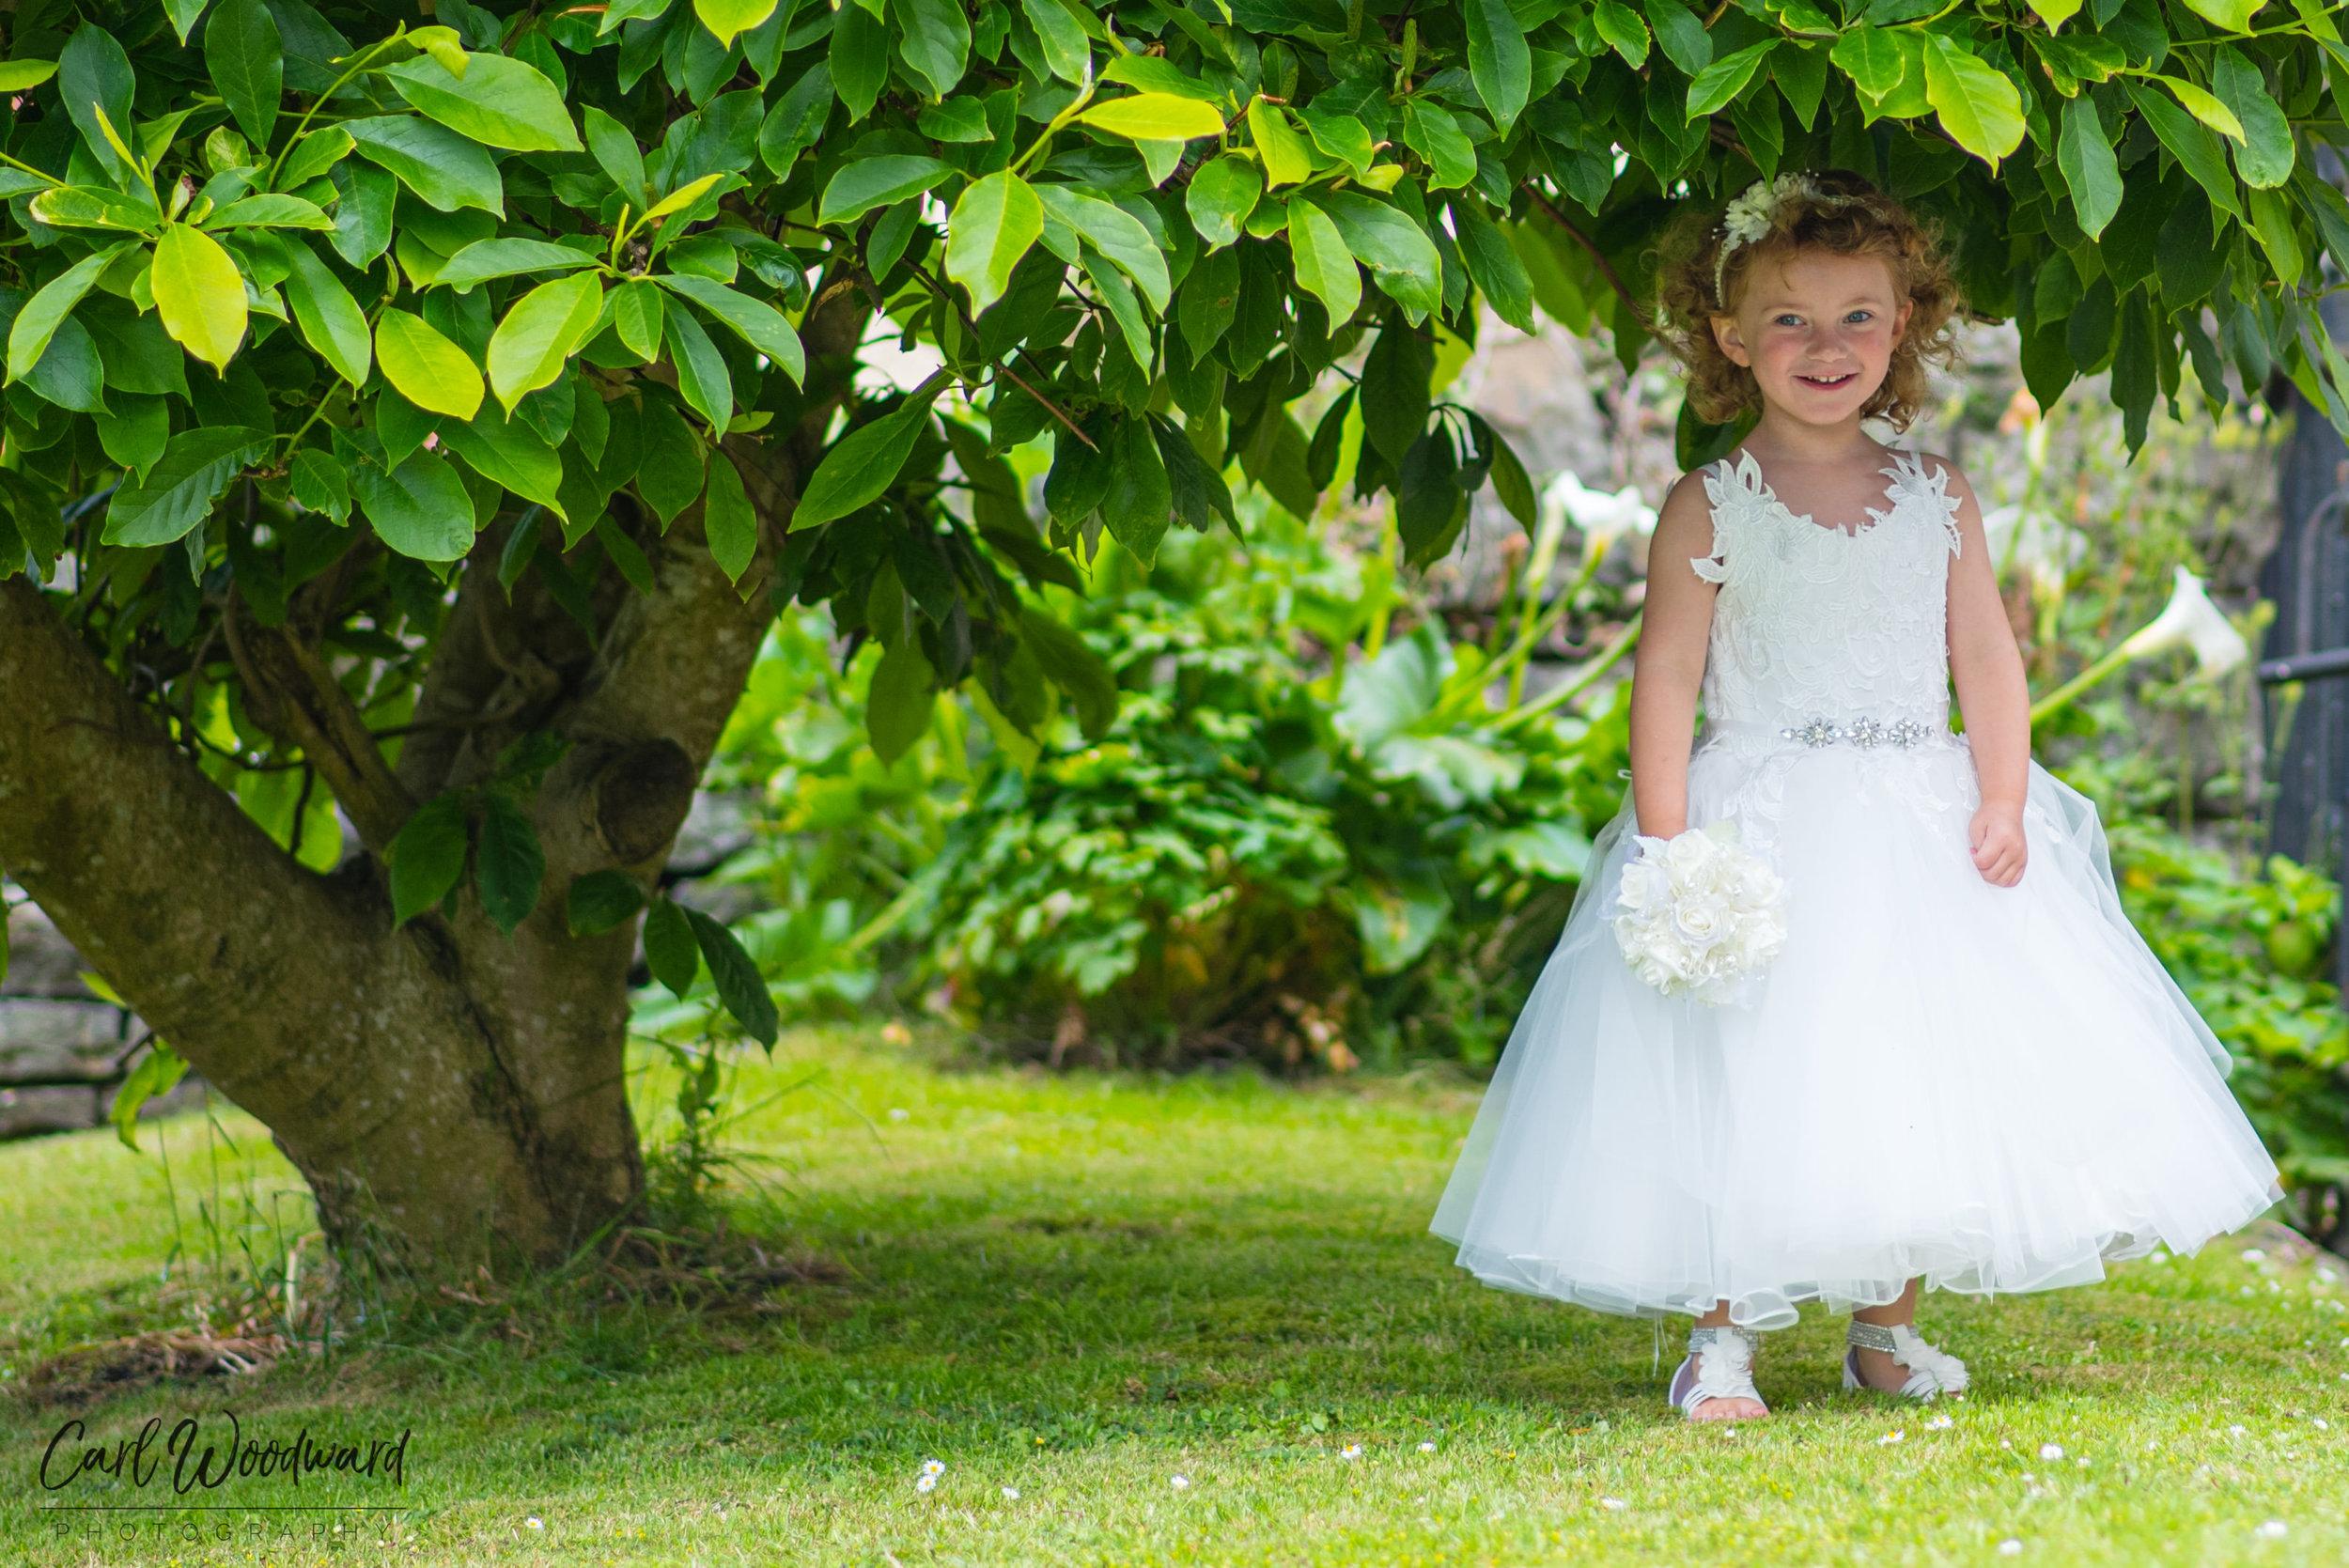 013-Mountain-Ash-Golf-Club-Wedding-Photography-Cardiff-Wedding-Photographer.jpg